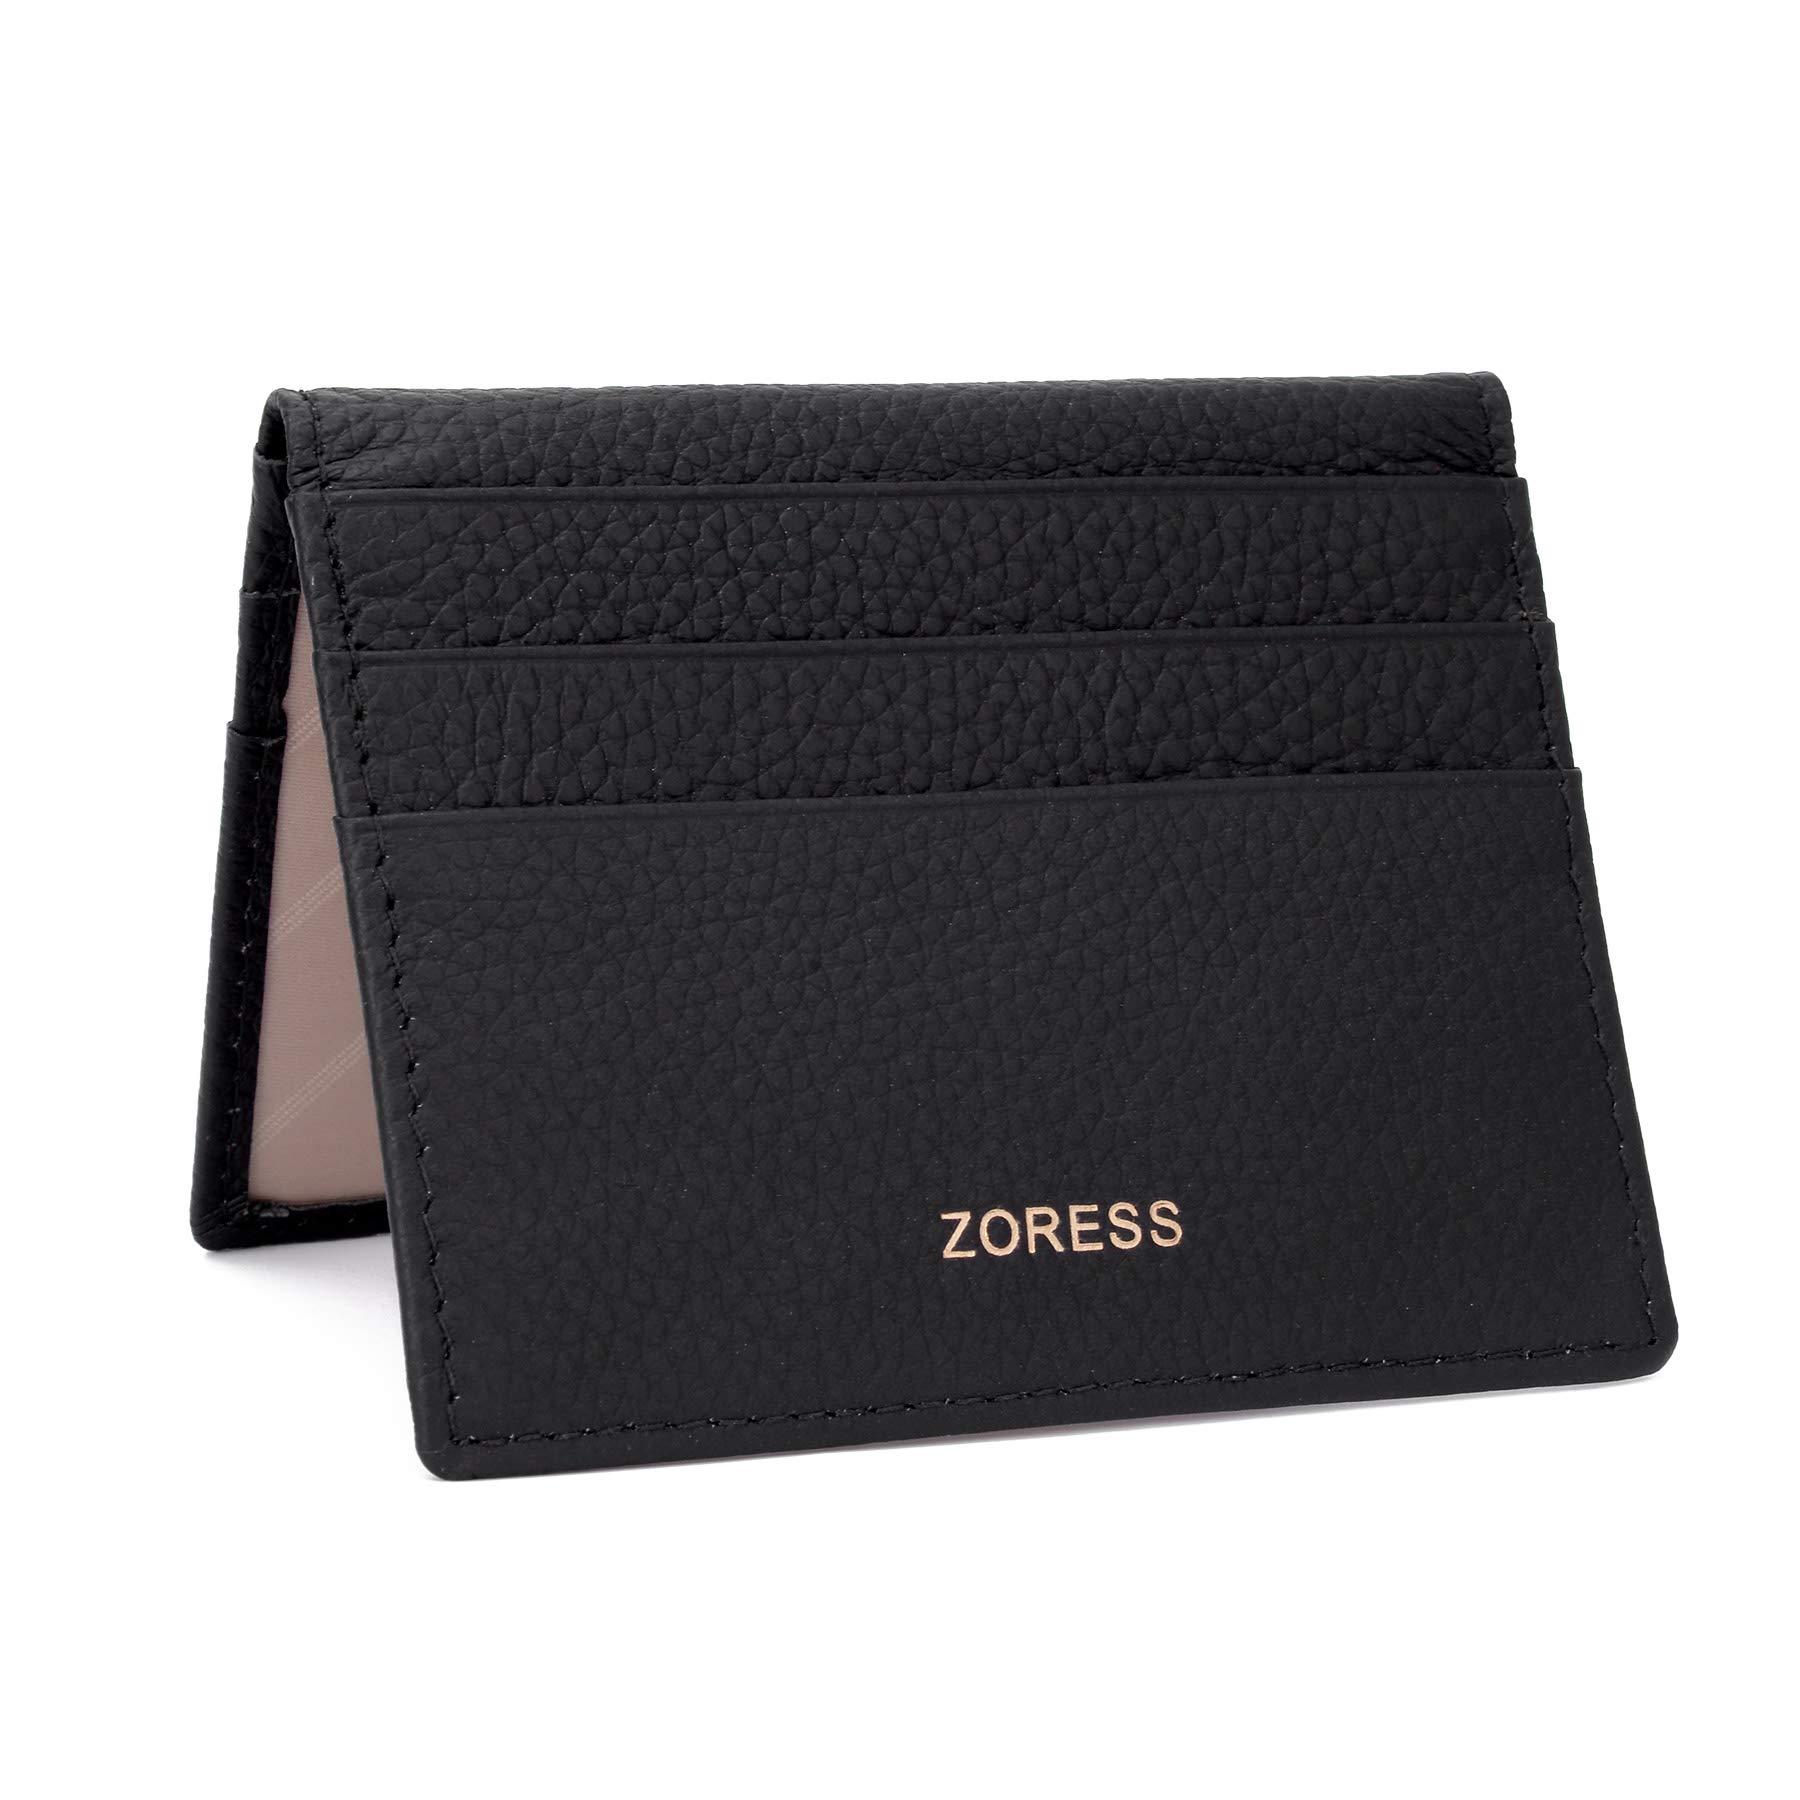 ZORESS Womens Leather RFID Blocking Slim Credit Card Case Holder Travel Front Pocket Wallet (Black)